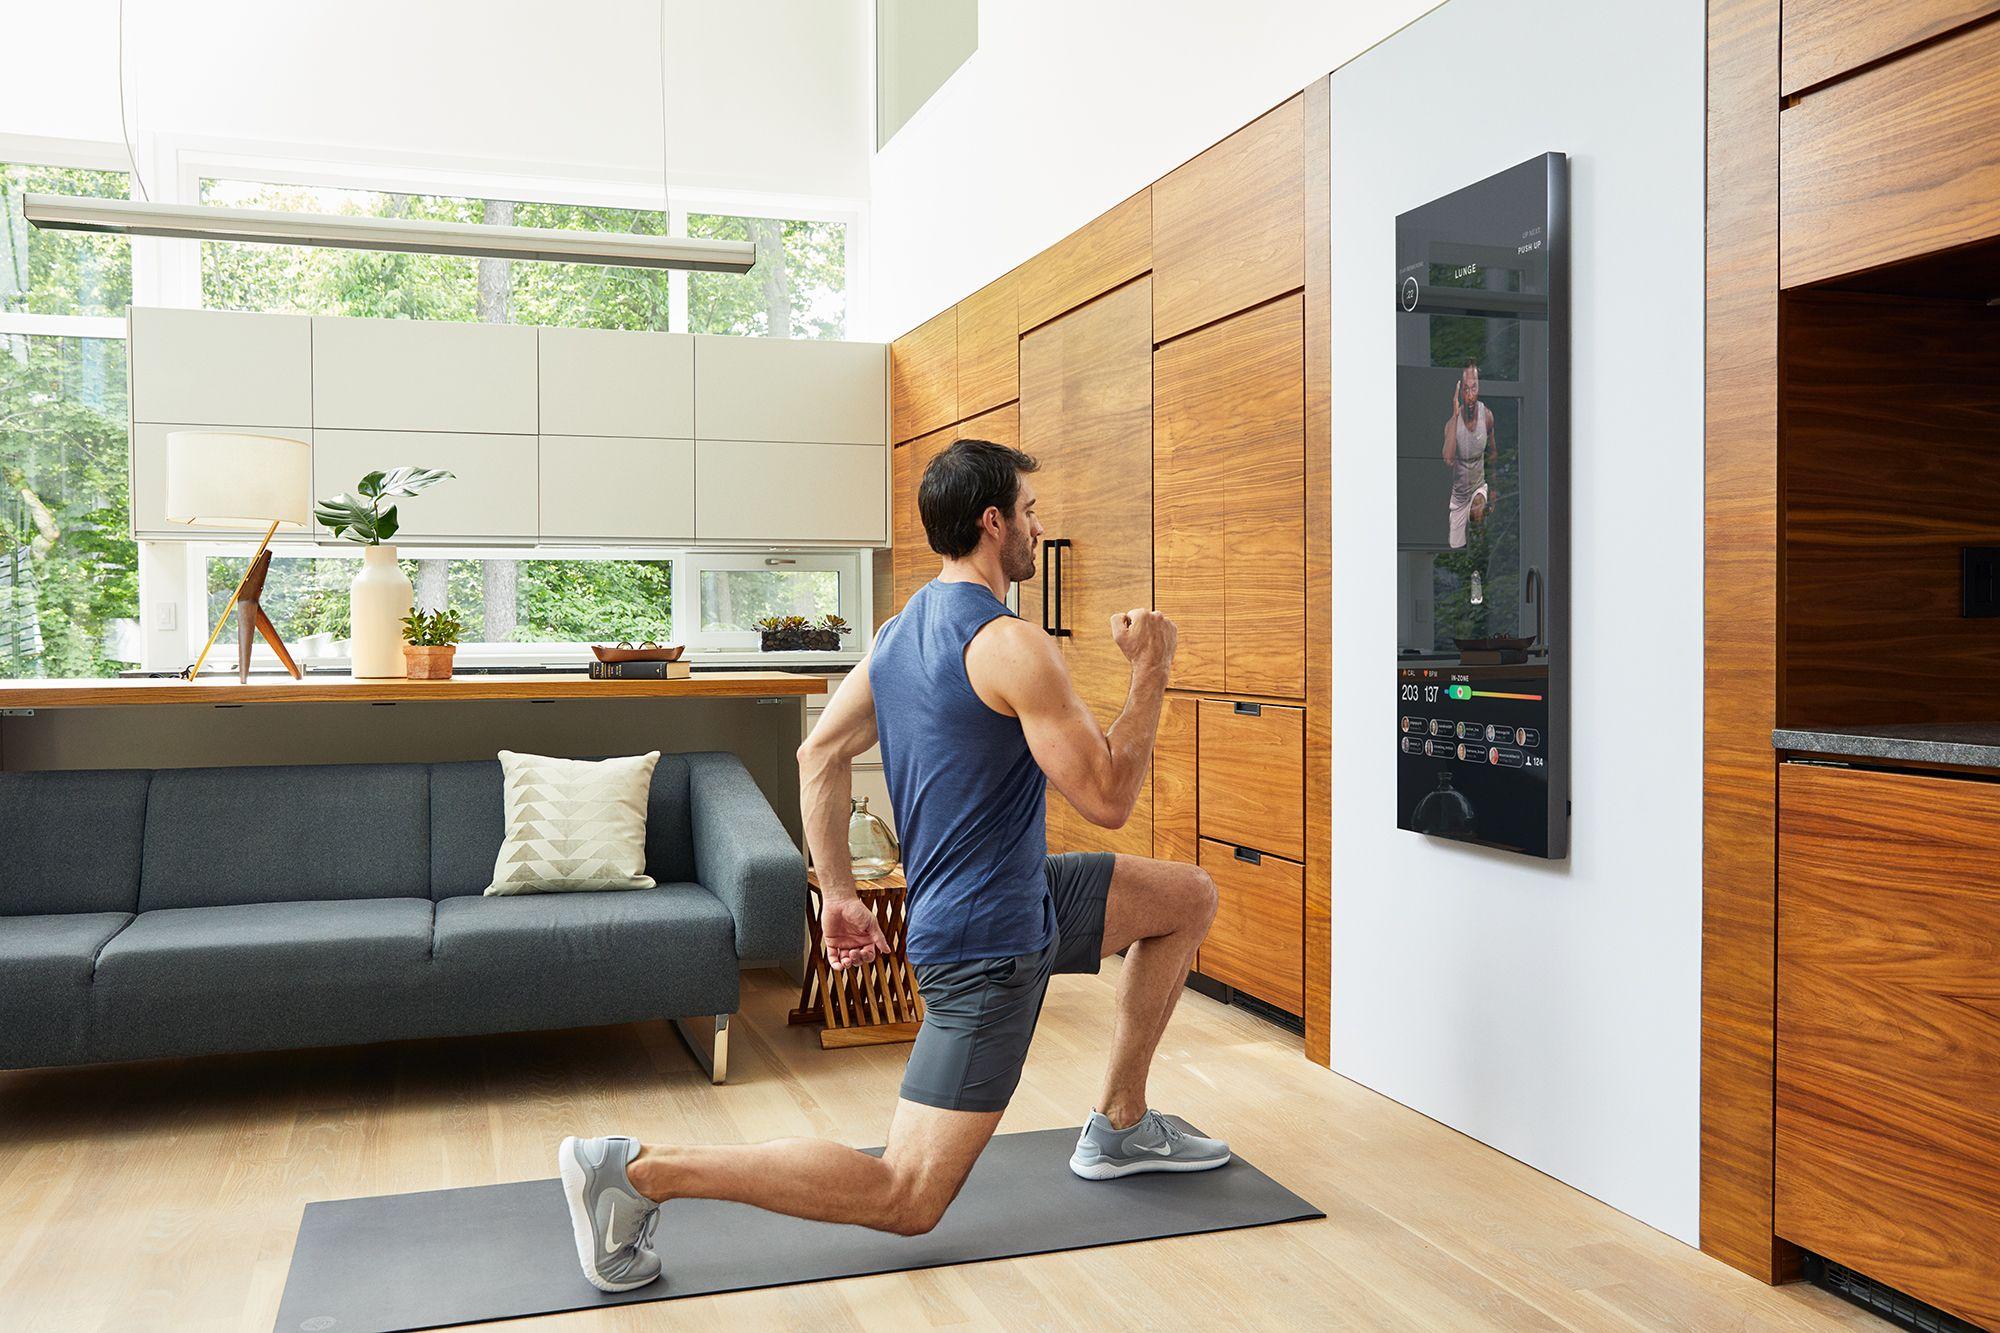 Men s health home fitness awards best home gym equipment